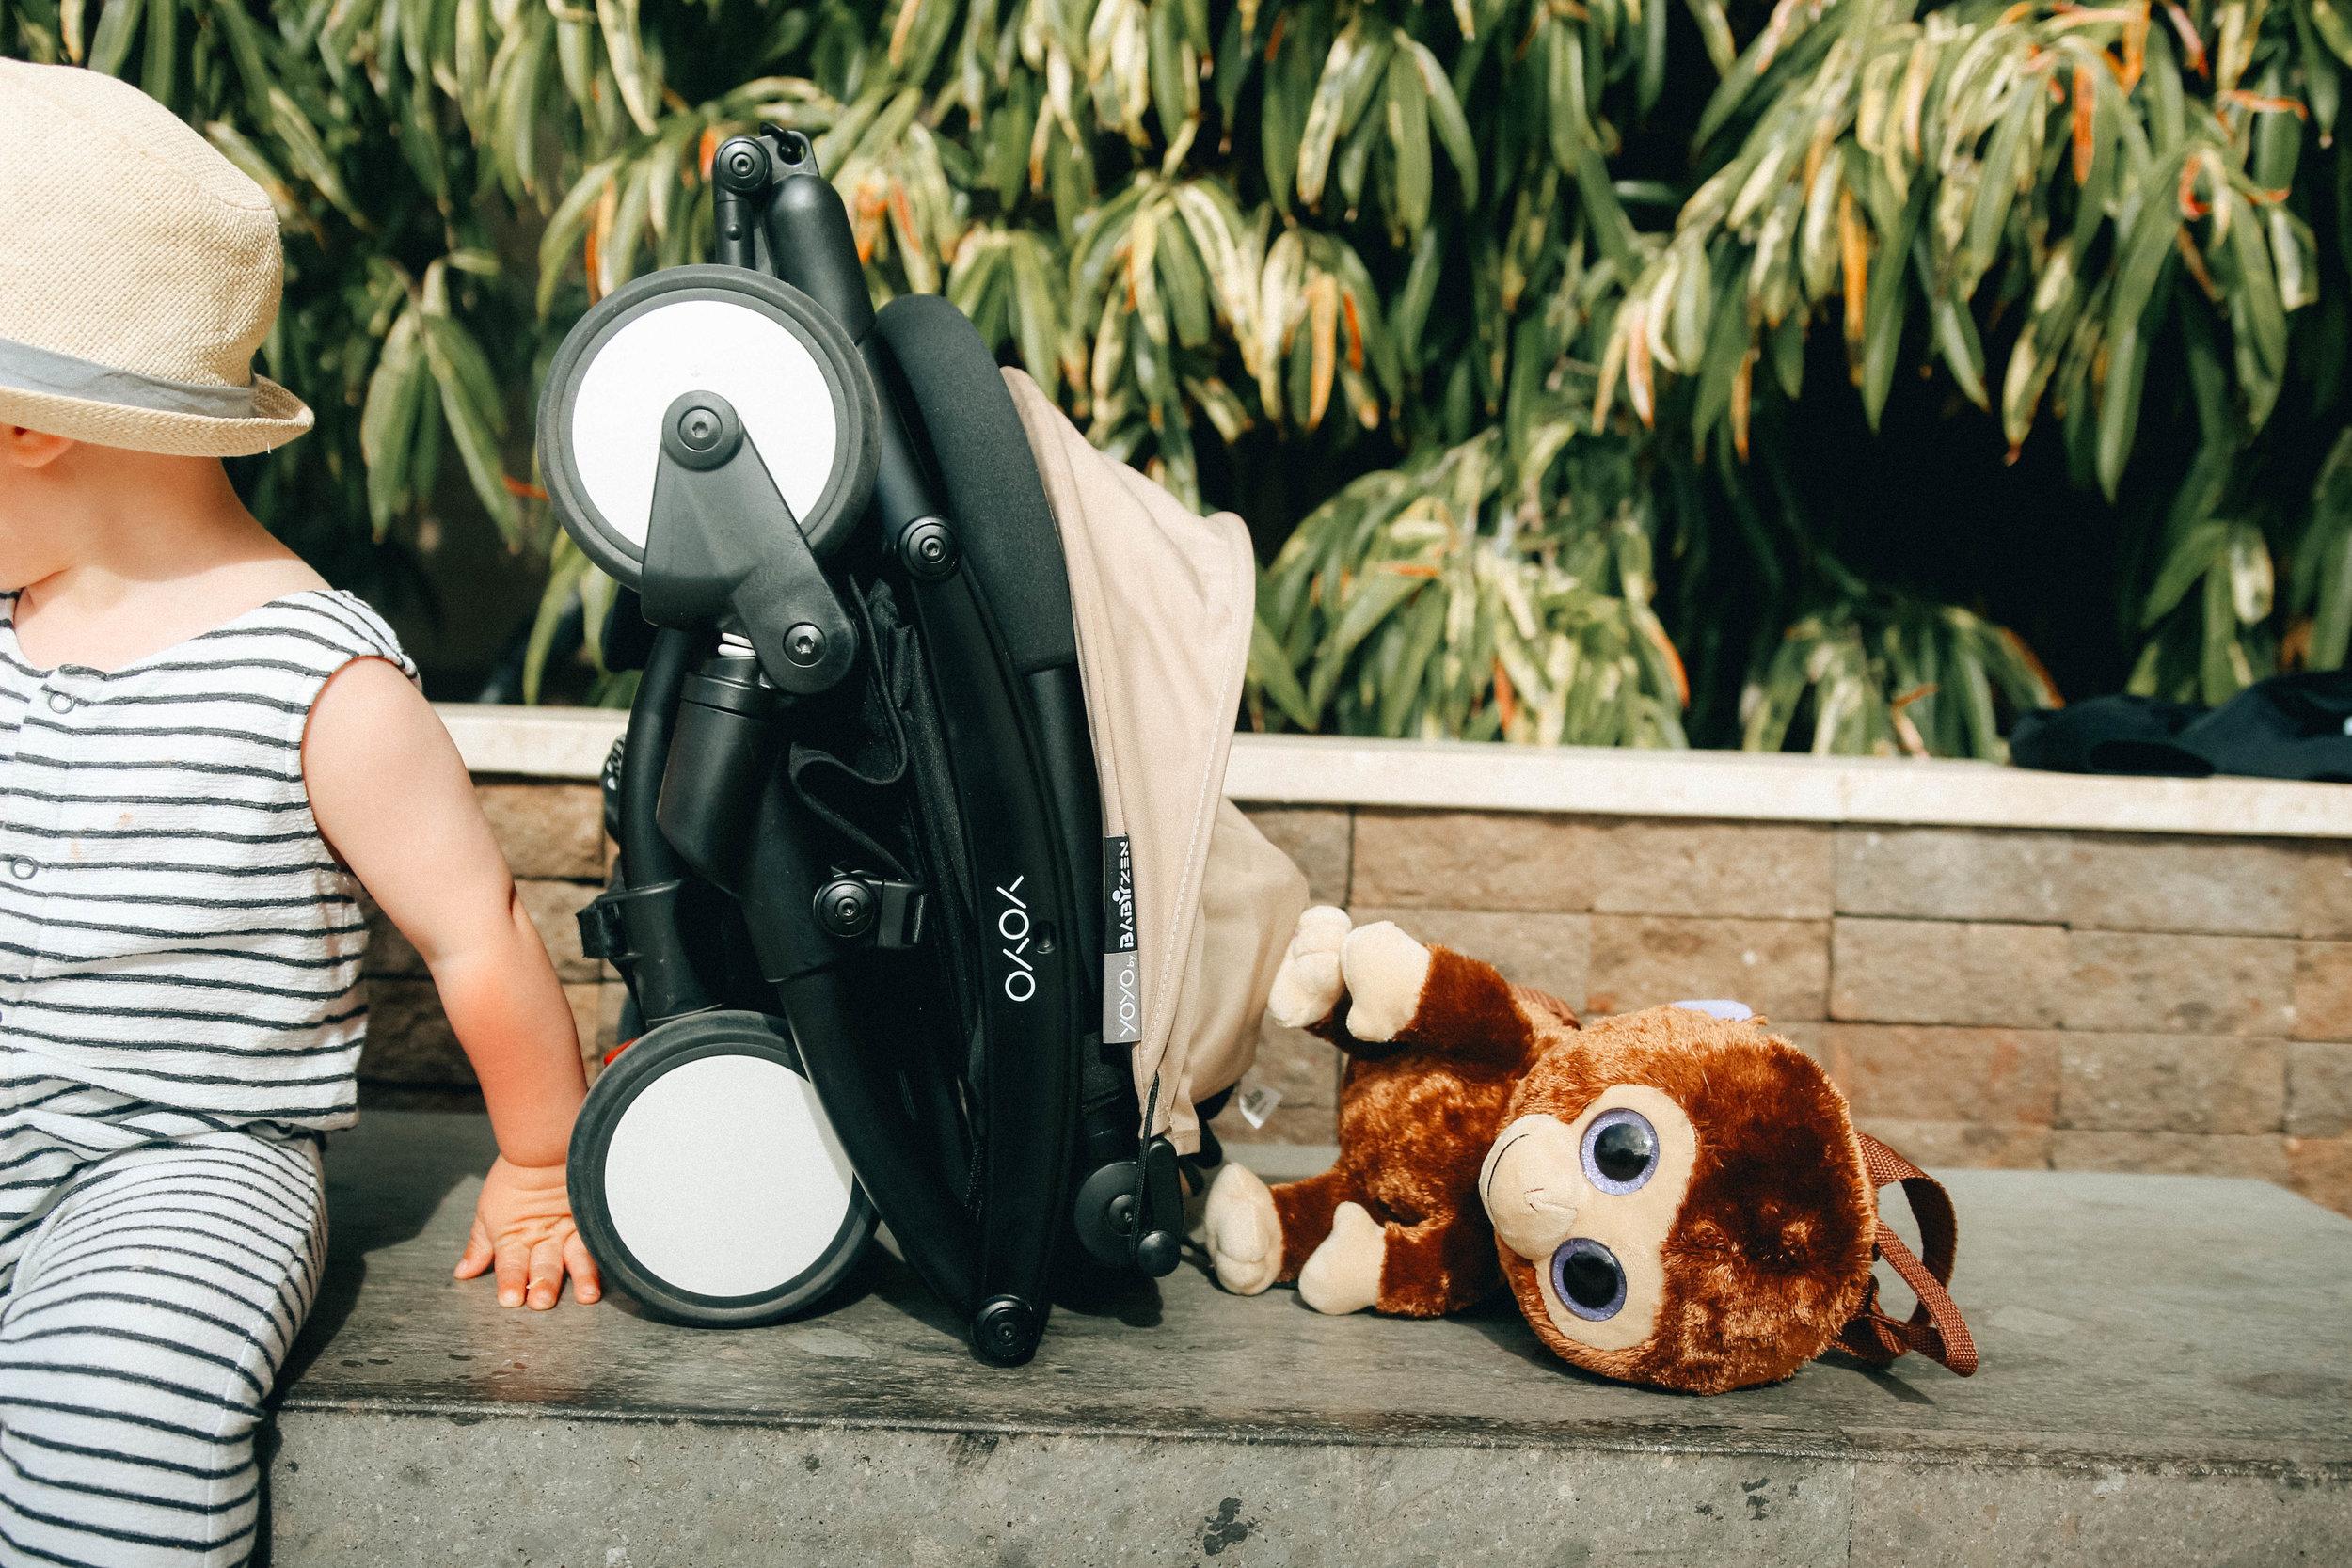 babyzen yoyo+ review travel stroller